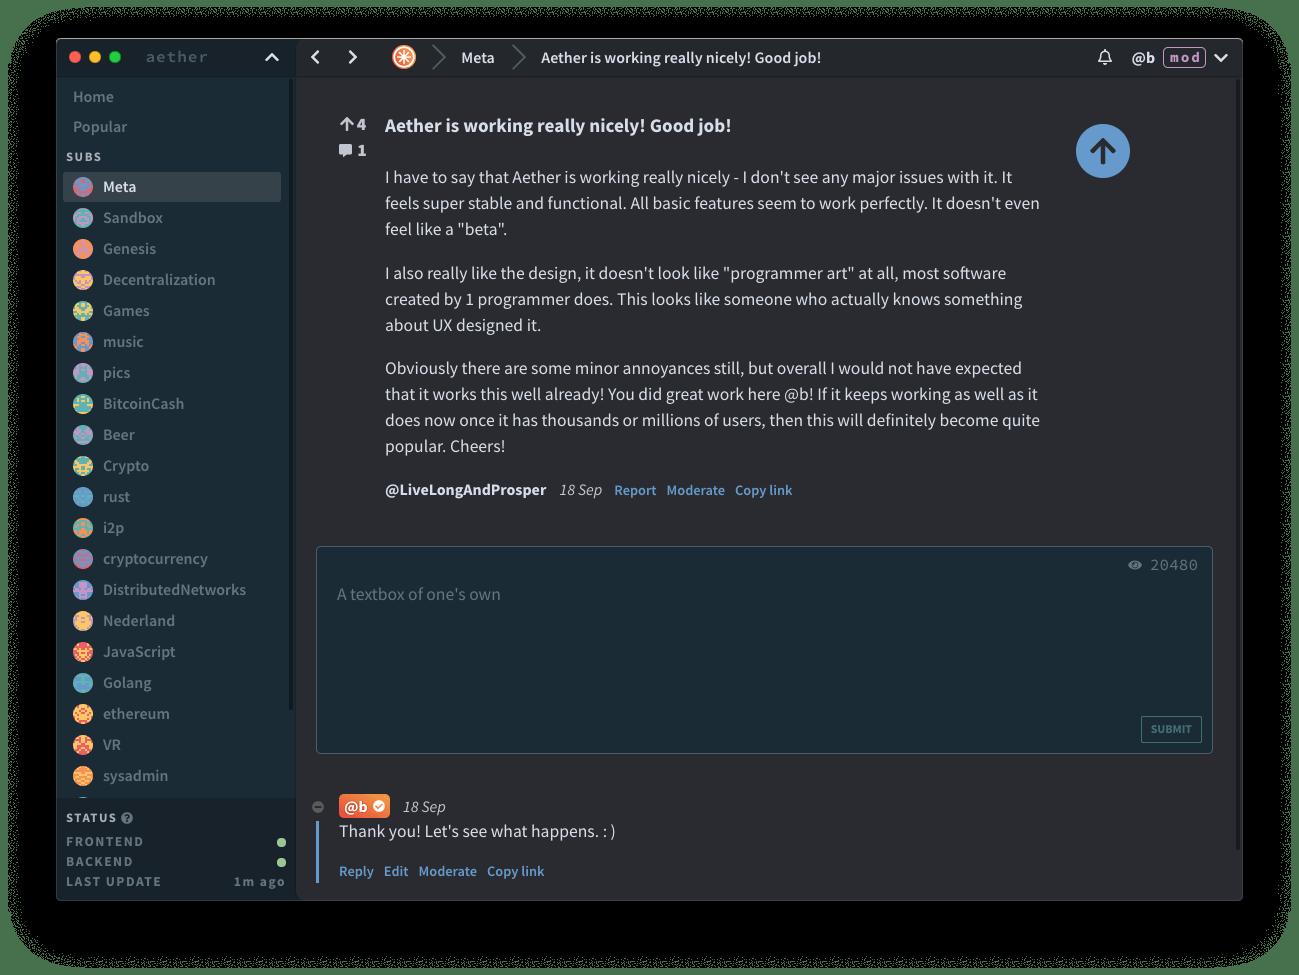 android best torrent client reddit